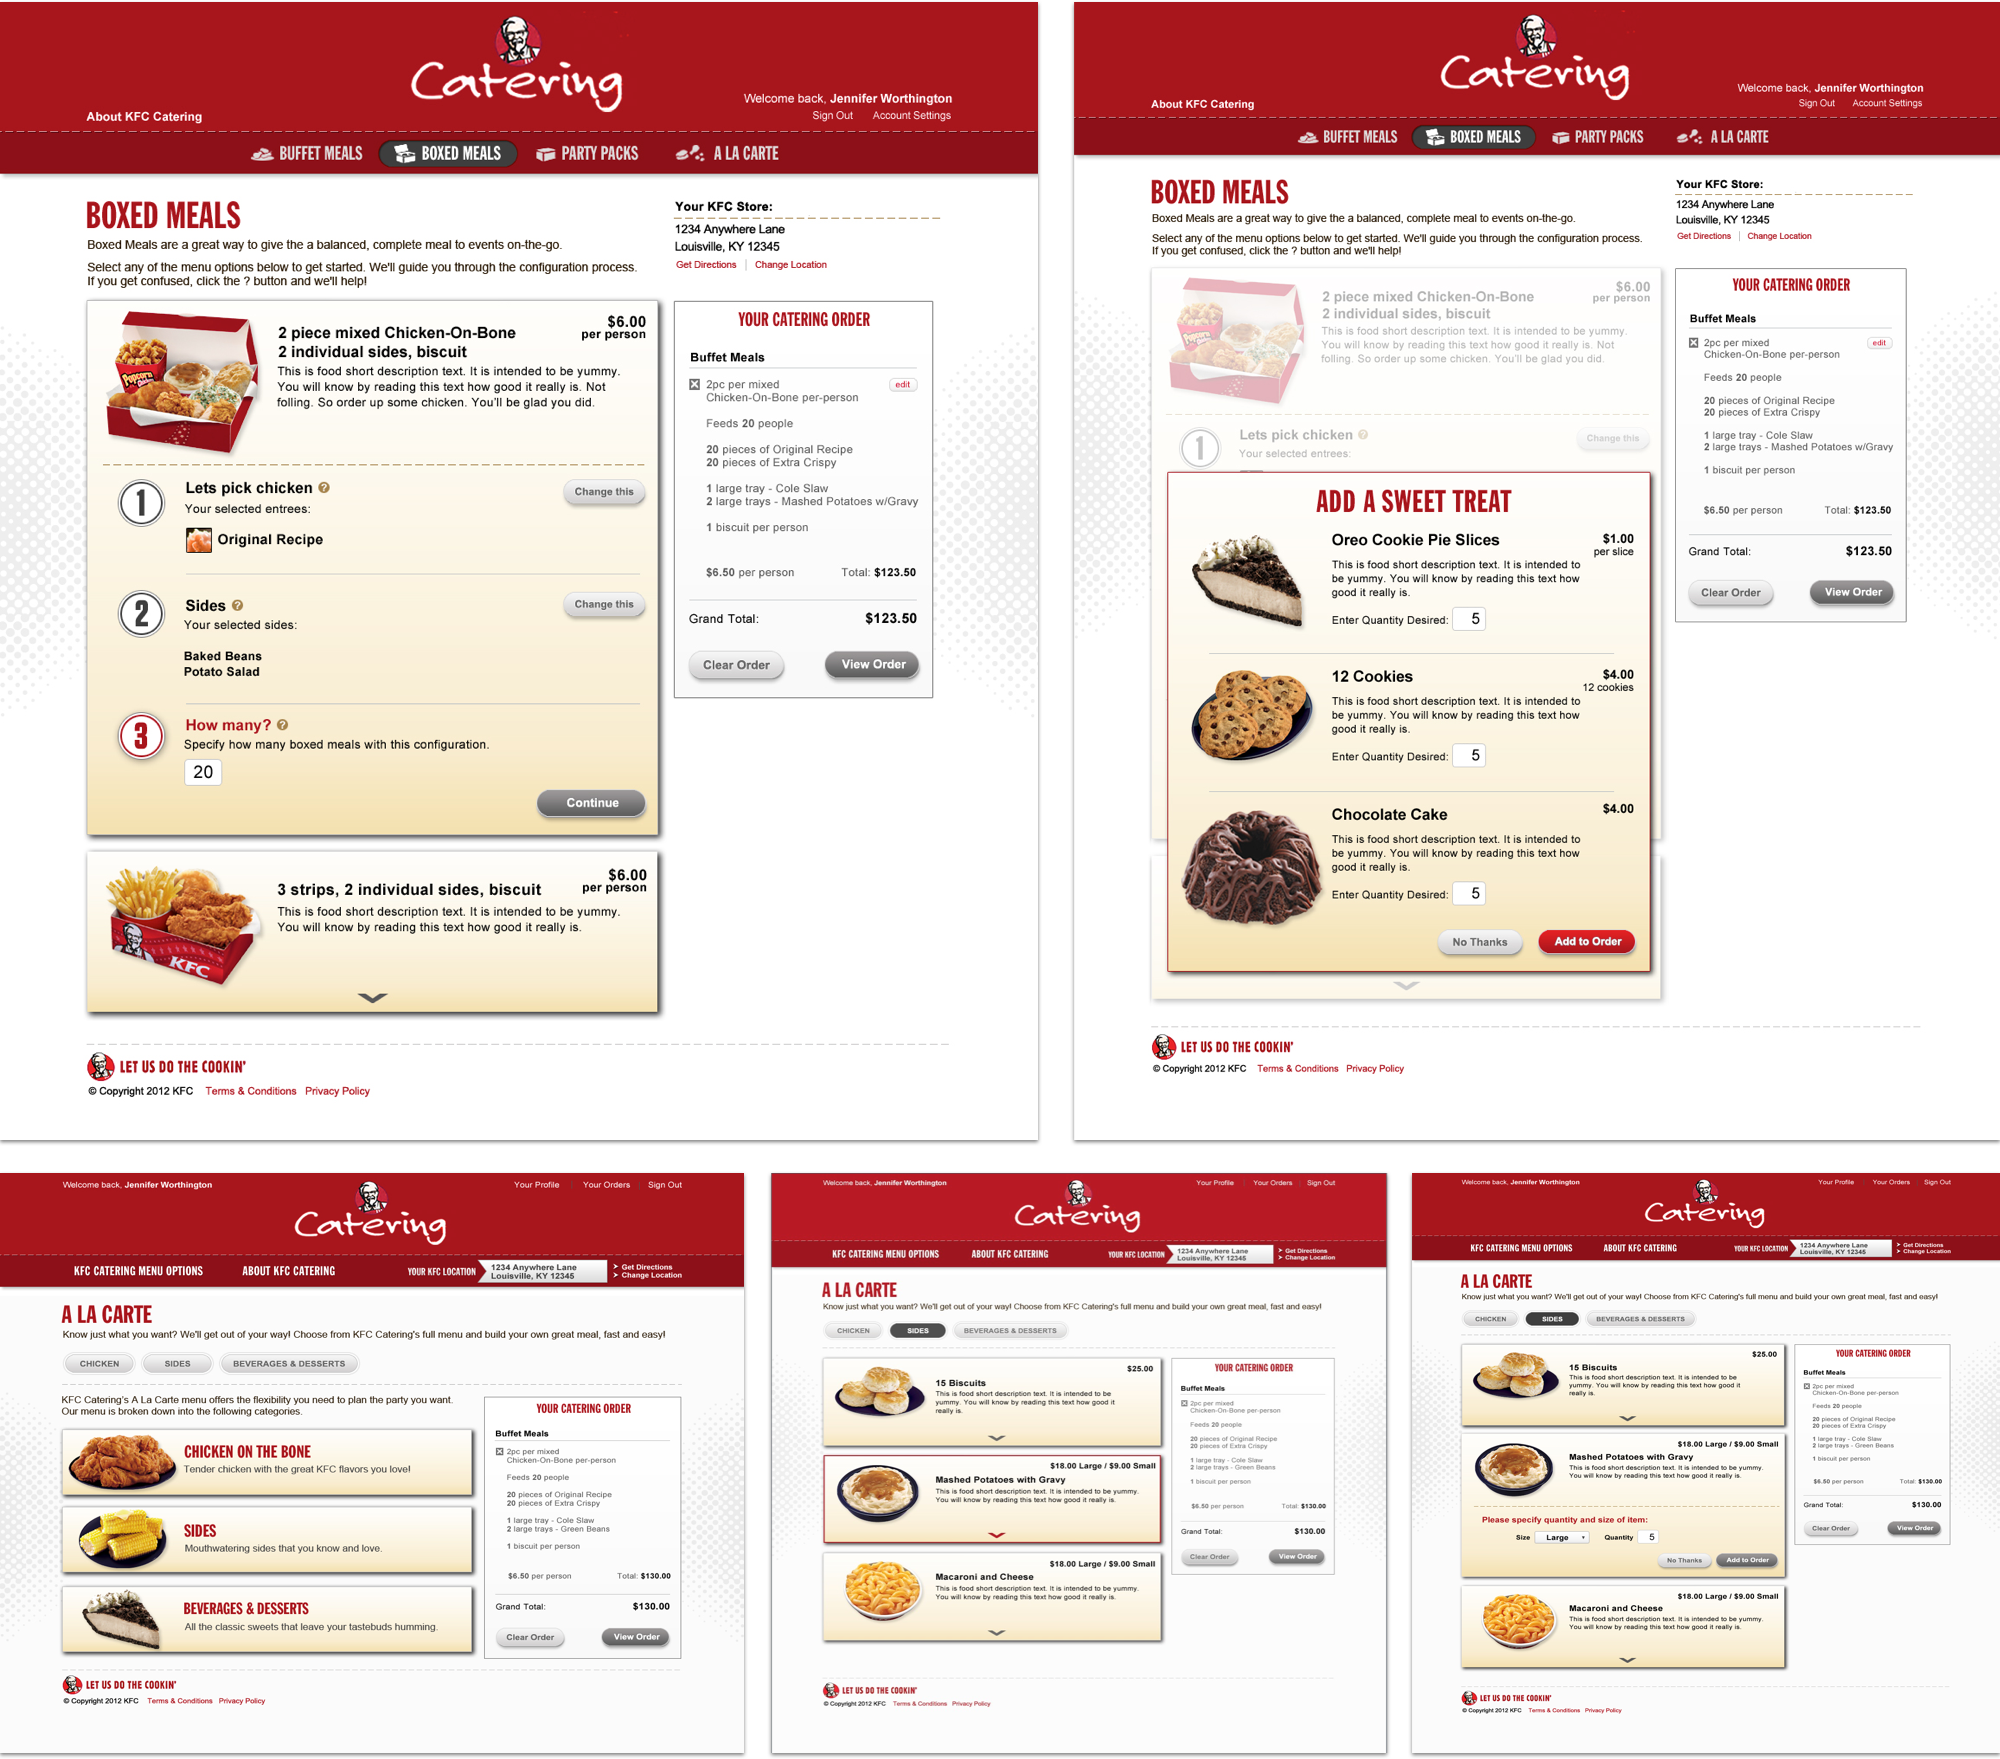 client_kfc-catering_menu-config